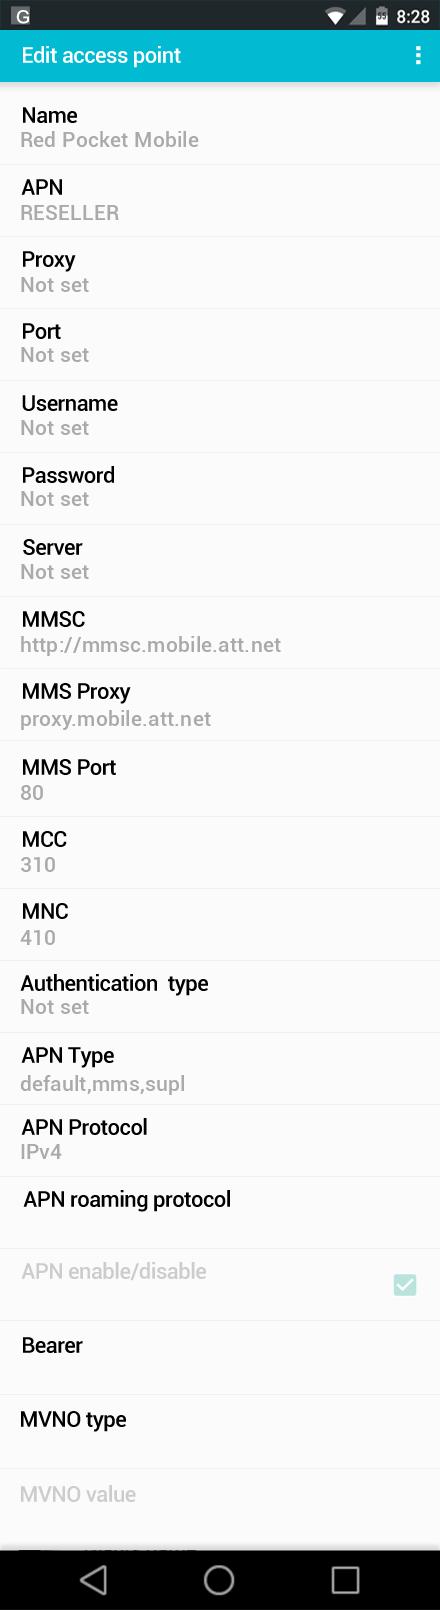 Red Pocket Mobile  APN settings for Android screenshot